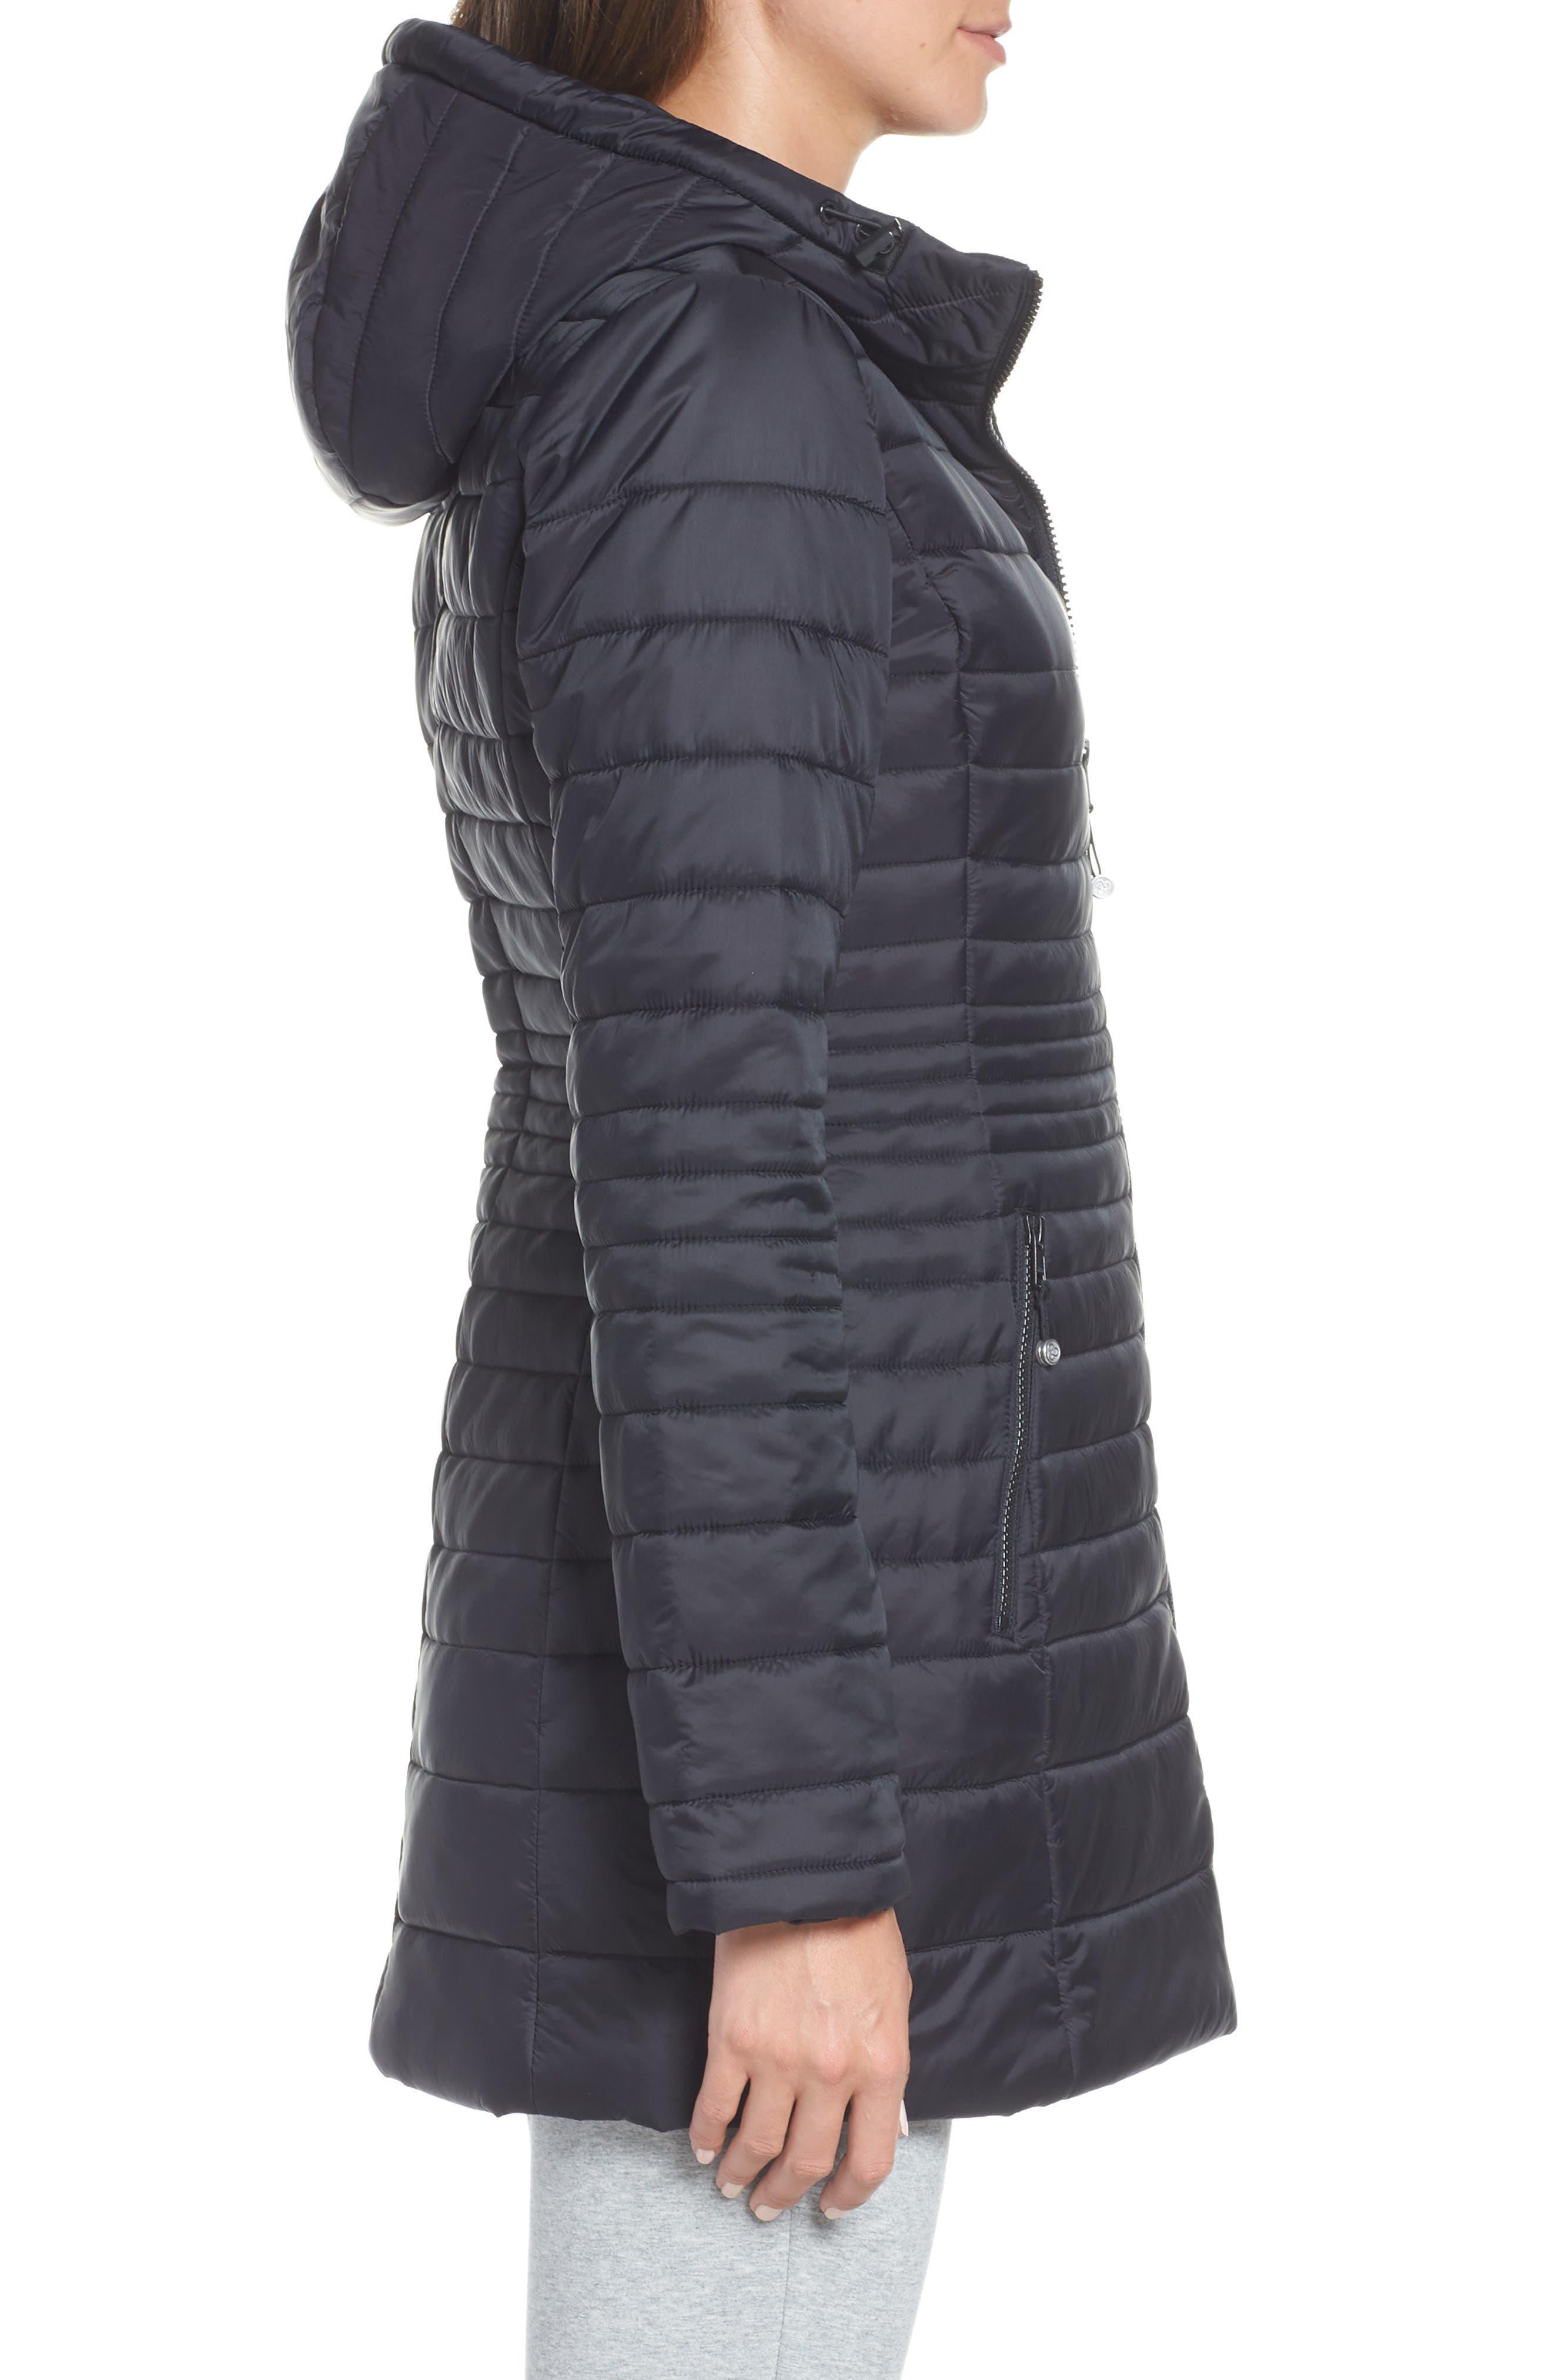 ZELLA, City Dweller Water Resistant Puffer Jacket, Alternate thumbnail 4, color, 001